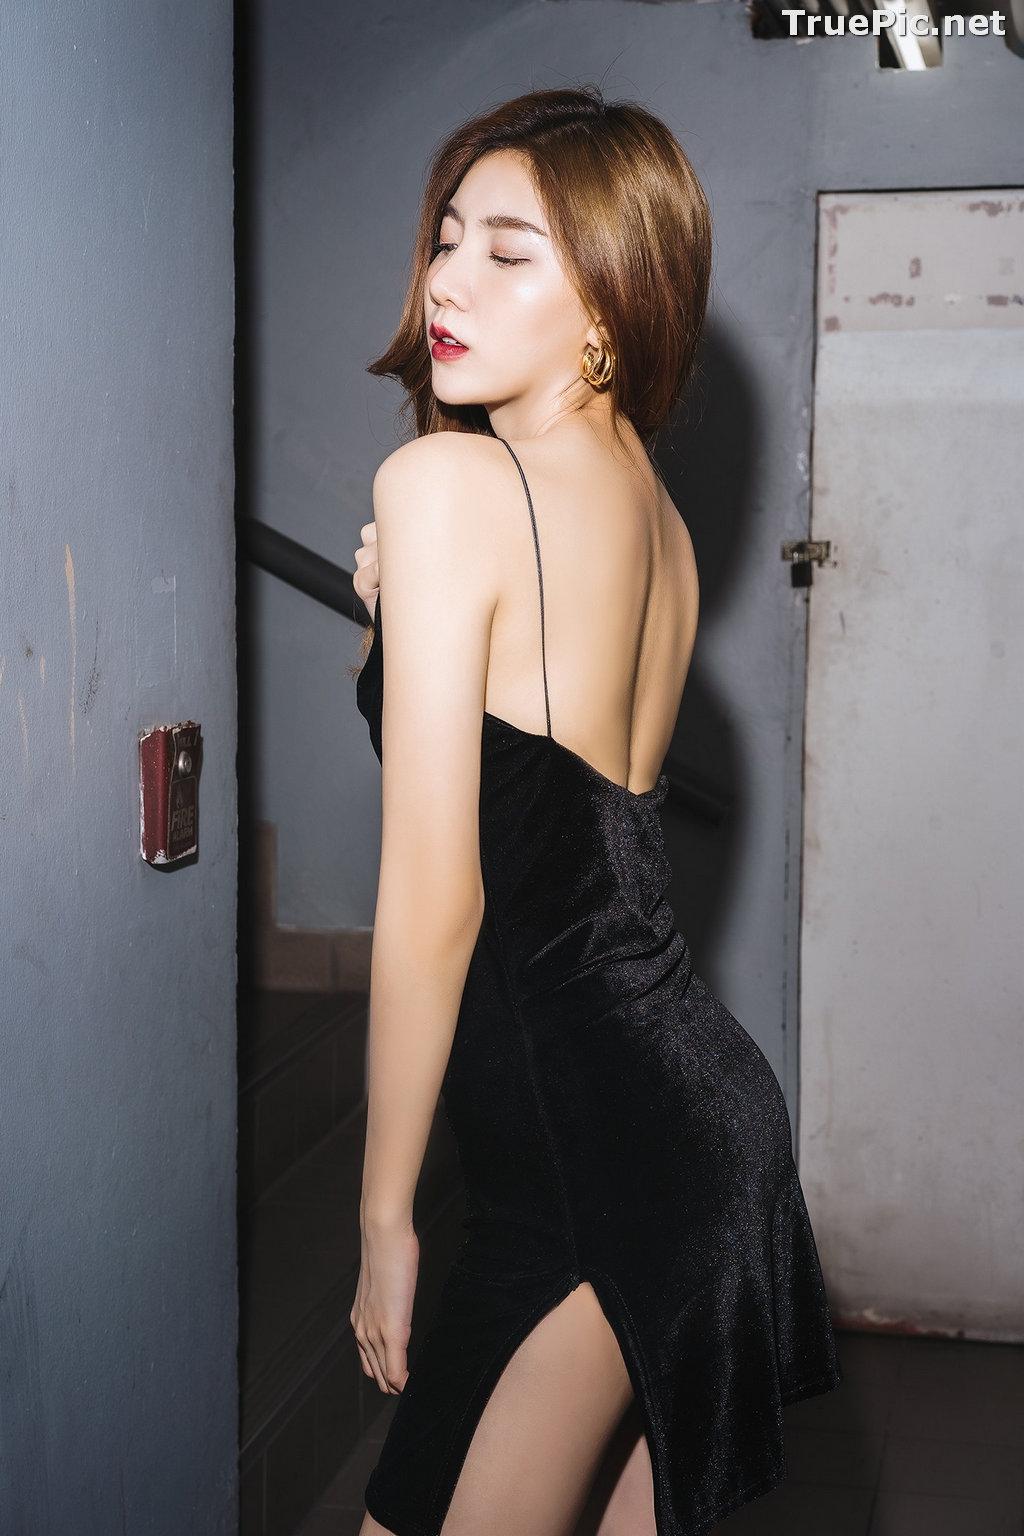 Image Thailand Model - Sasi Ngiunwan - Black For SiamNight - TruePic.net - Picture-21